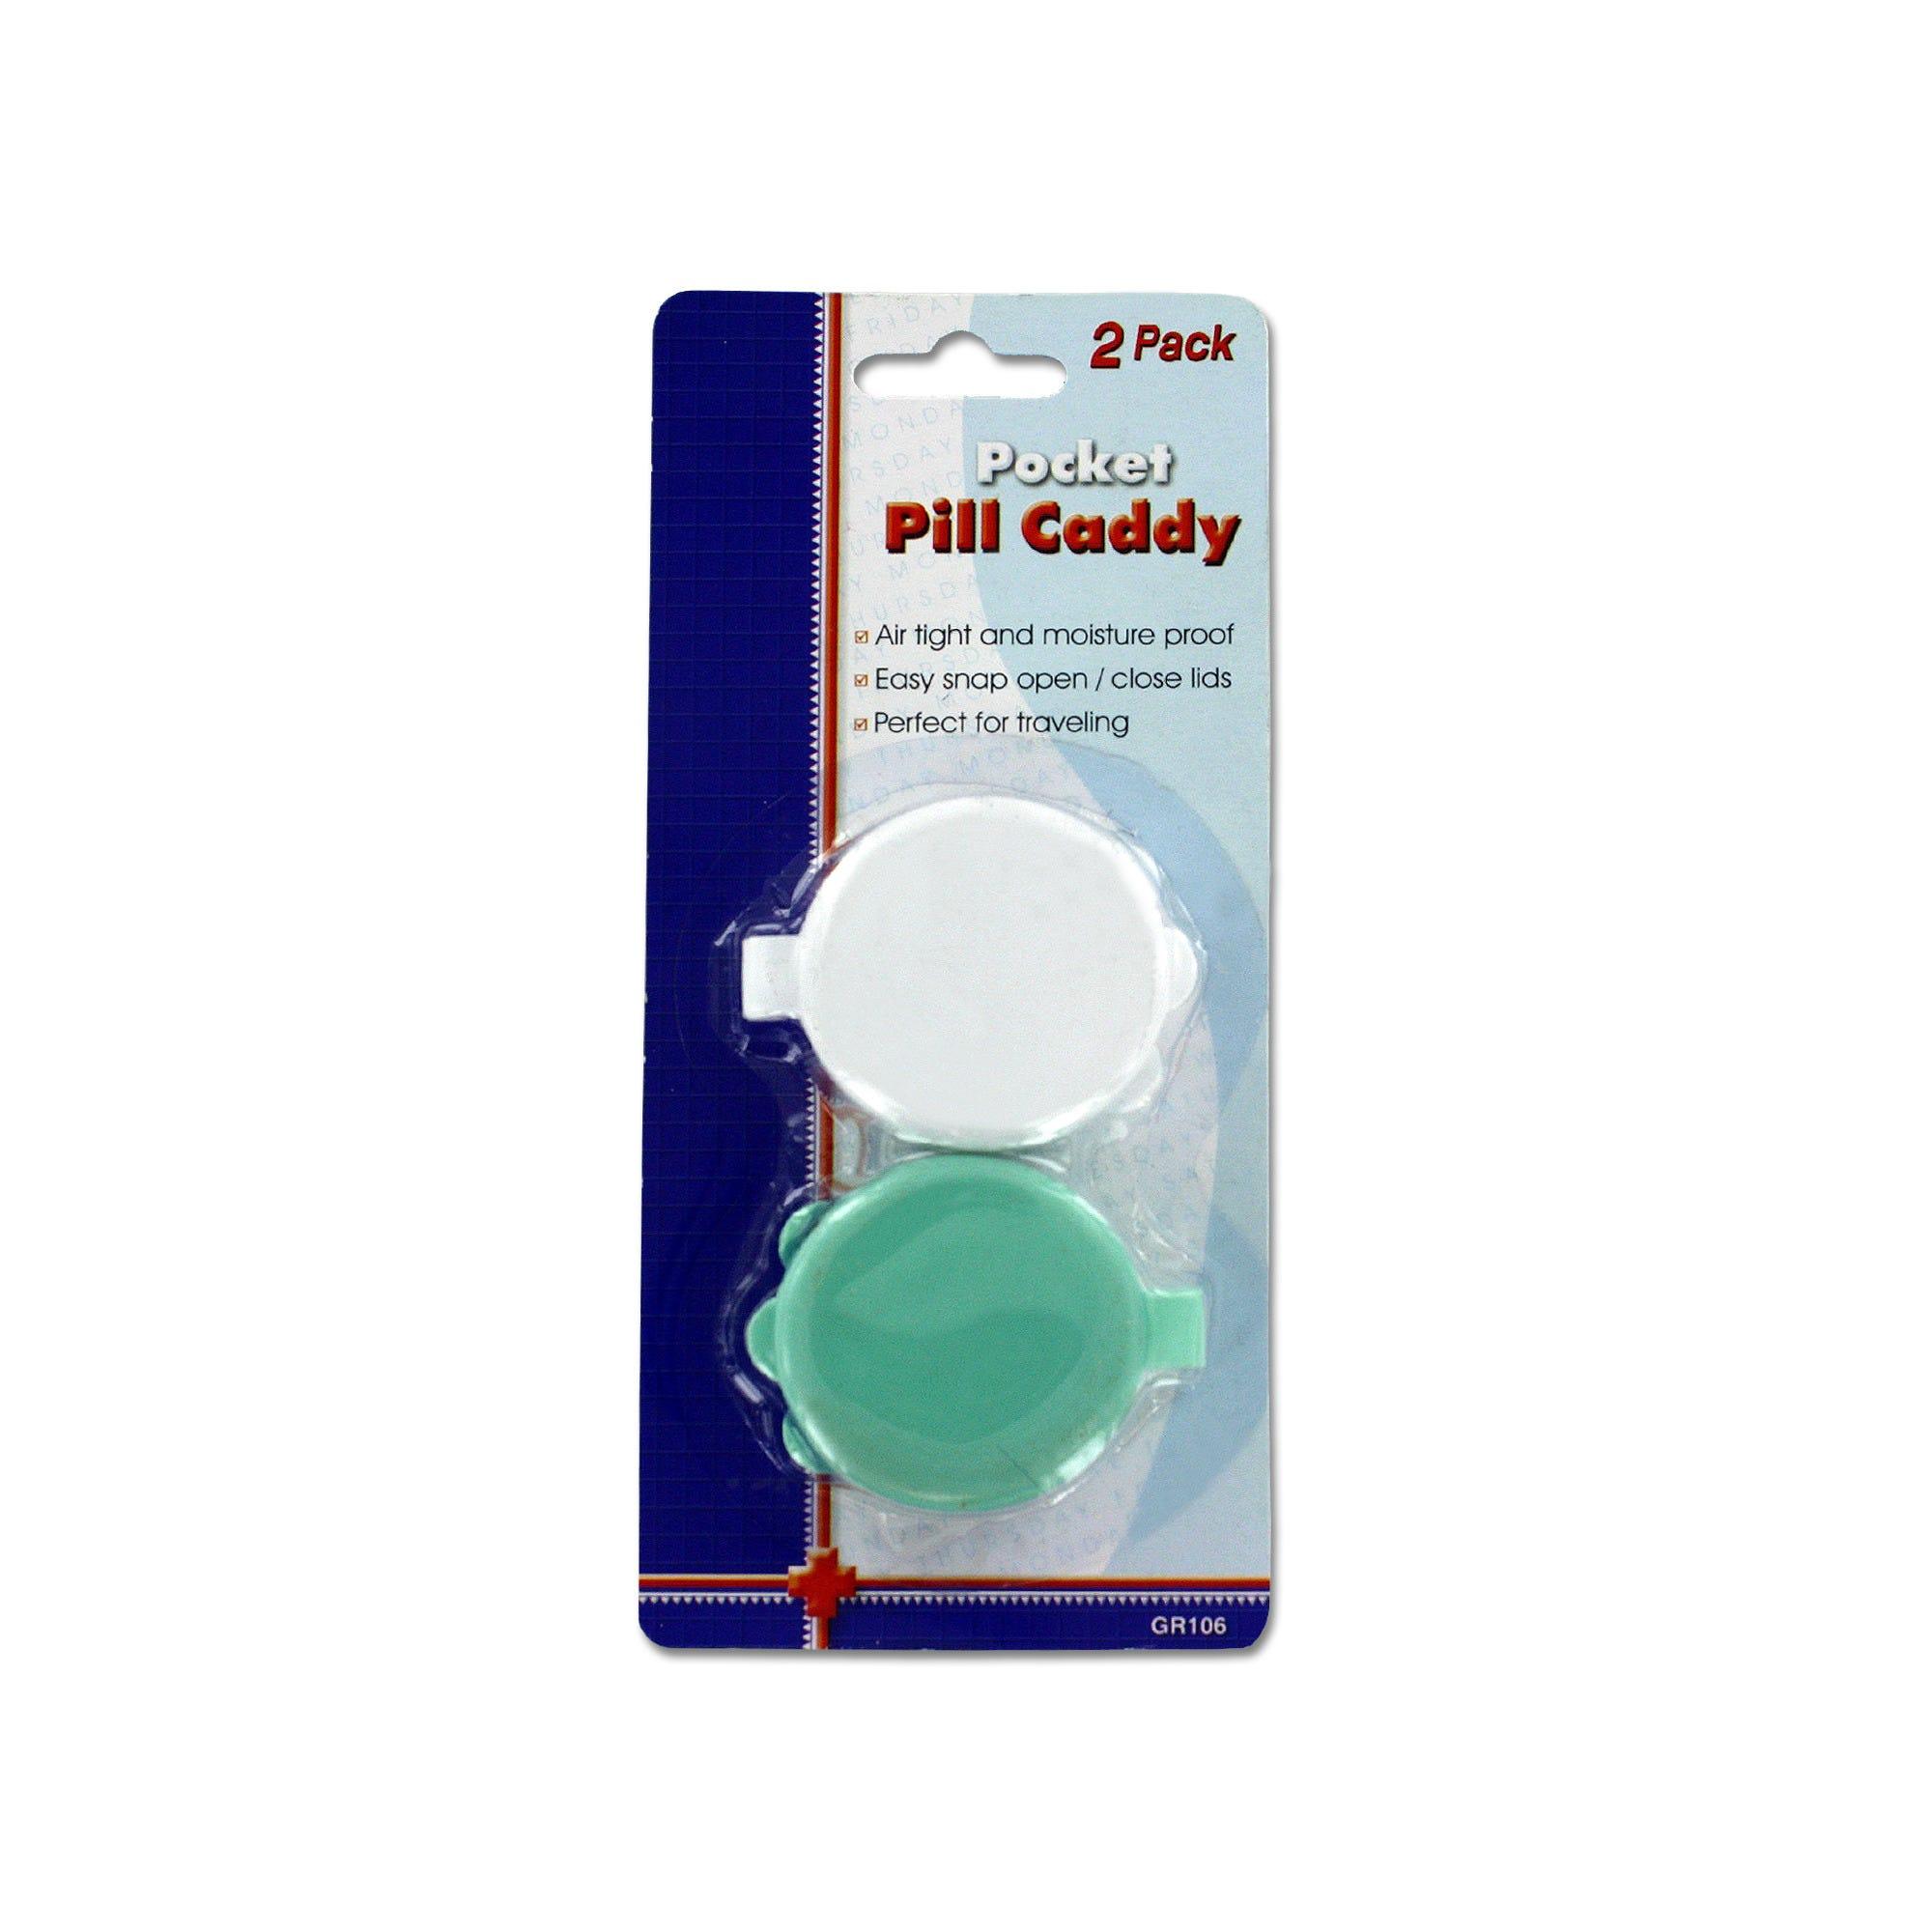 Pocket Pill Caddy Set